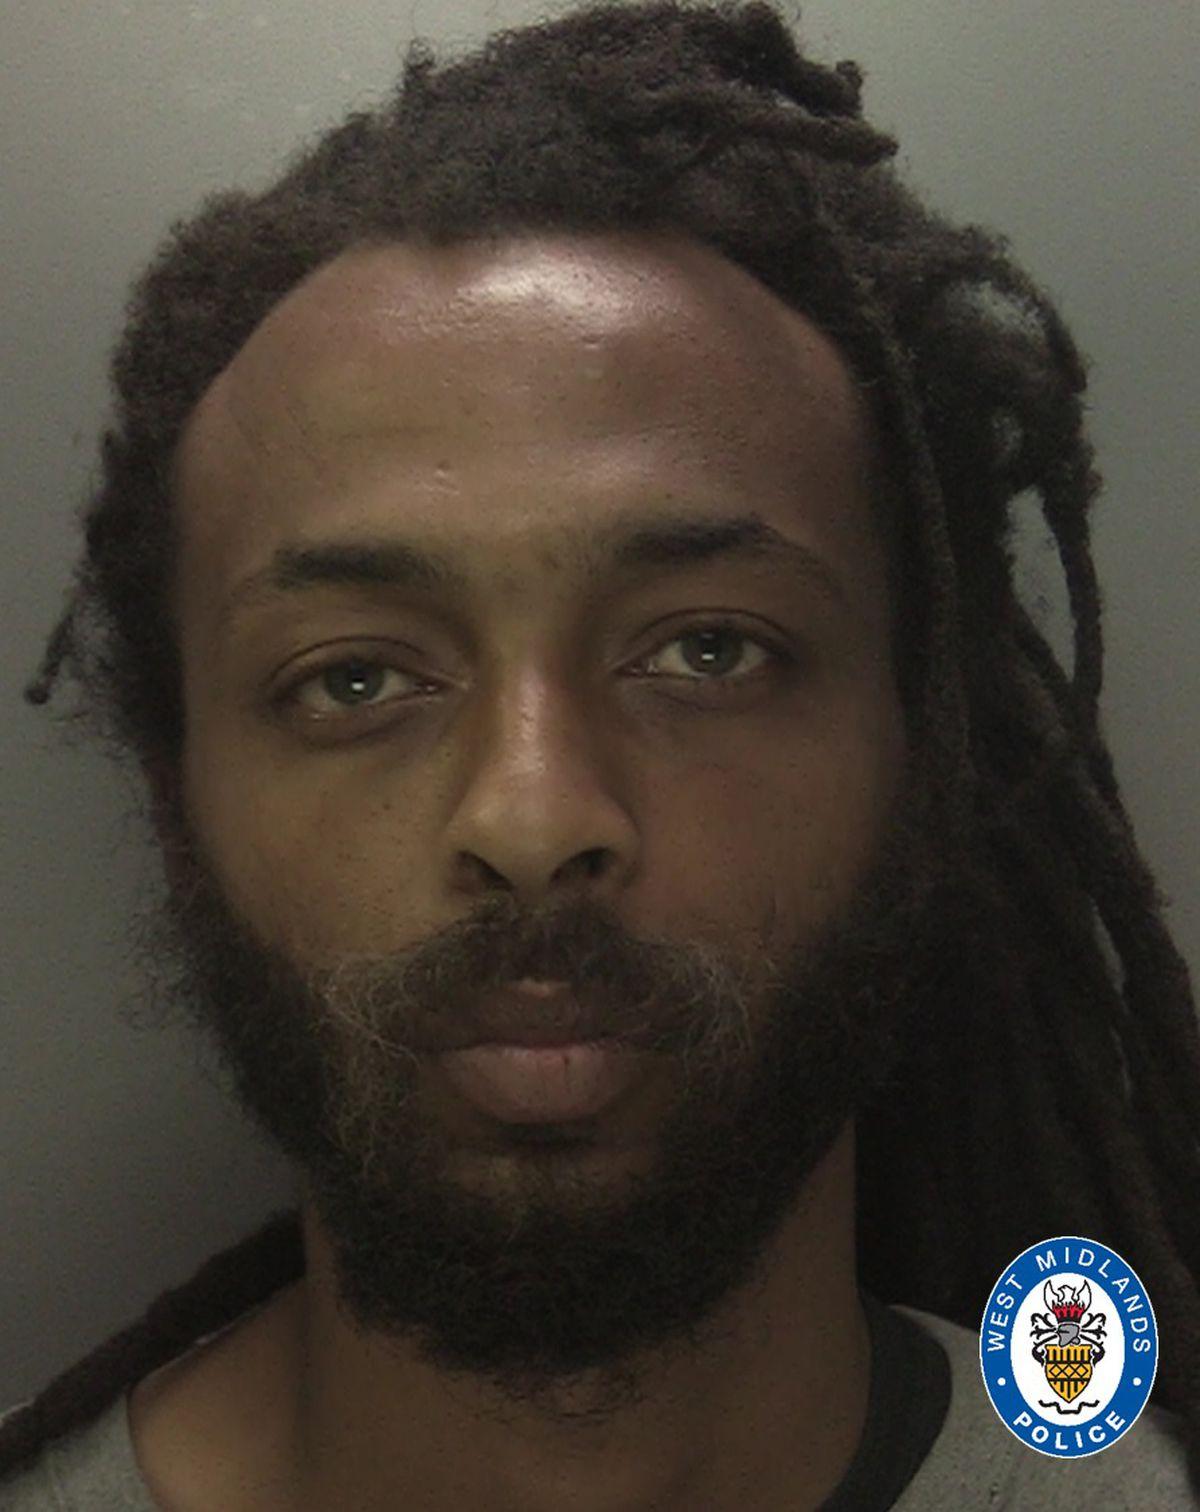 Ishmael Farquharson. Photo: West Midlands Police